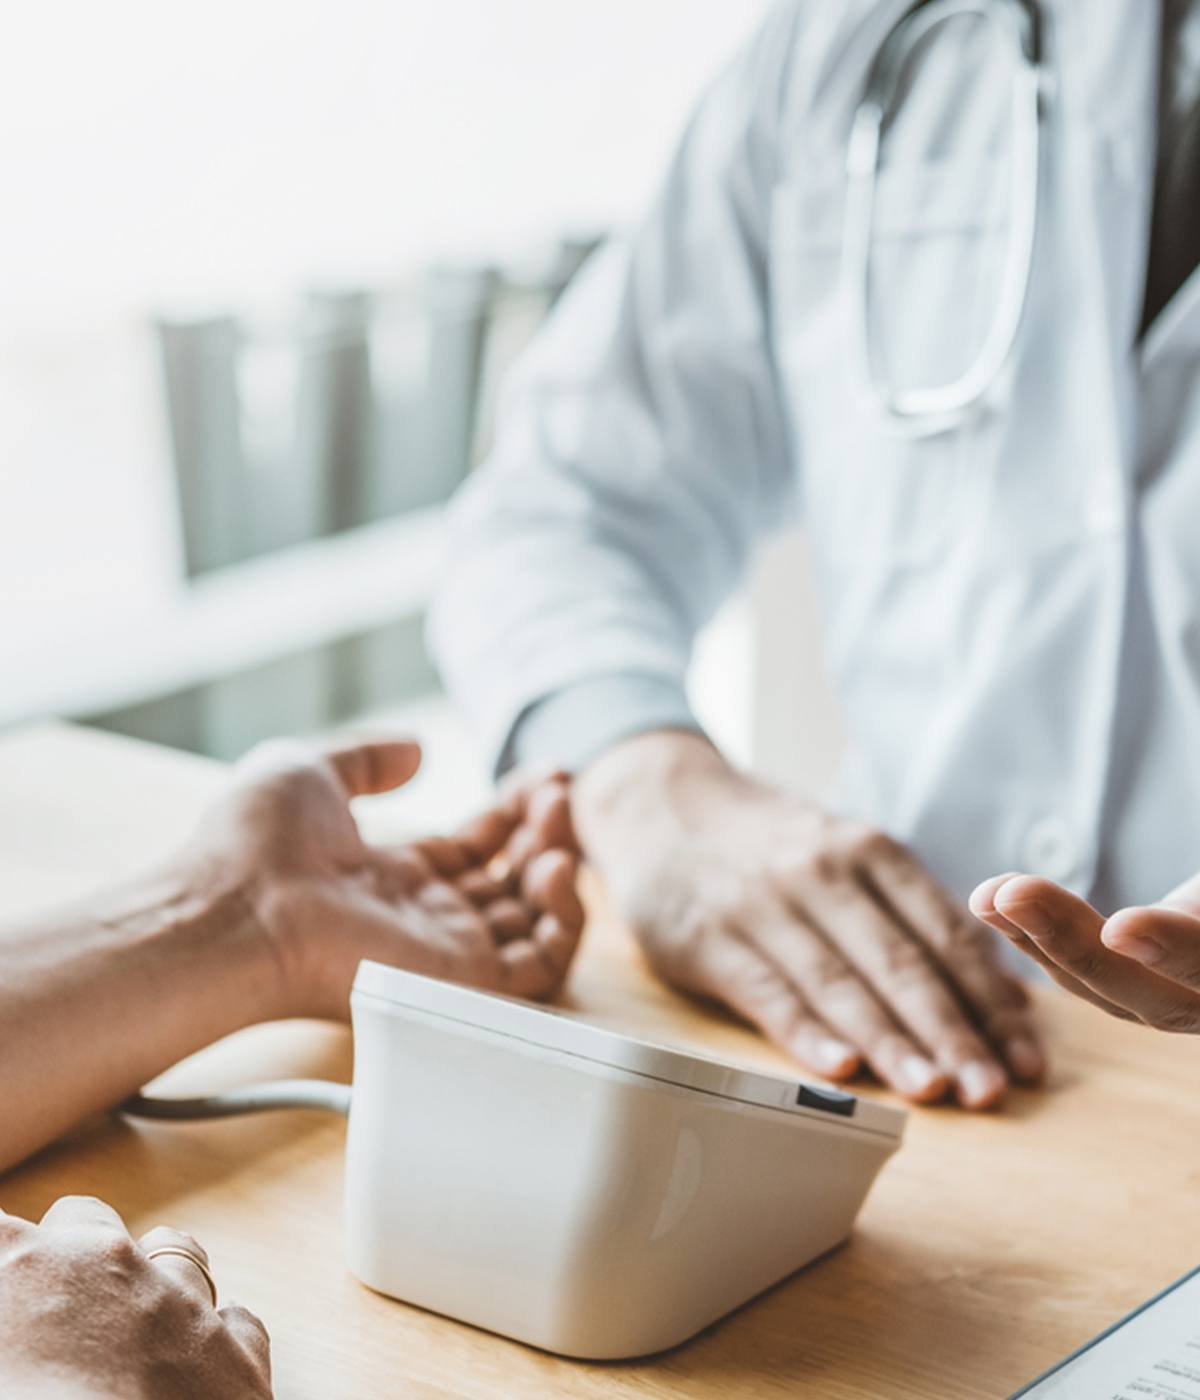 Dupuytren's Contracture - Doctor Examining Hand